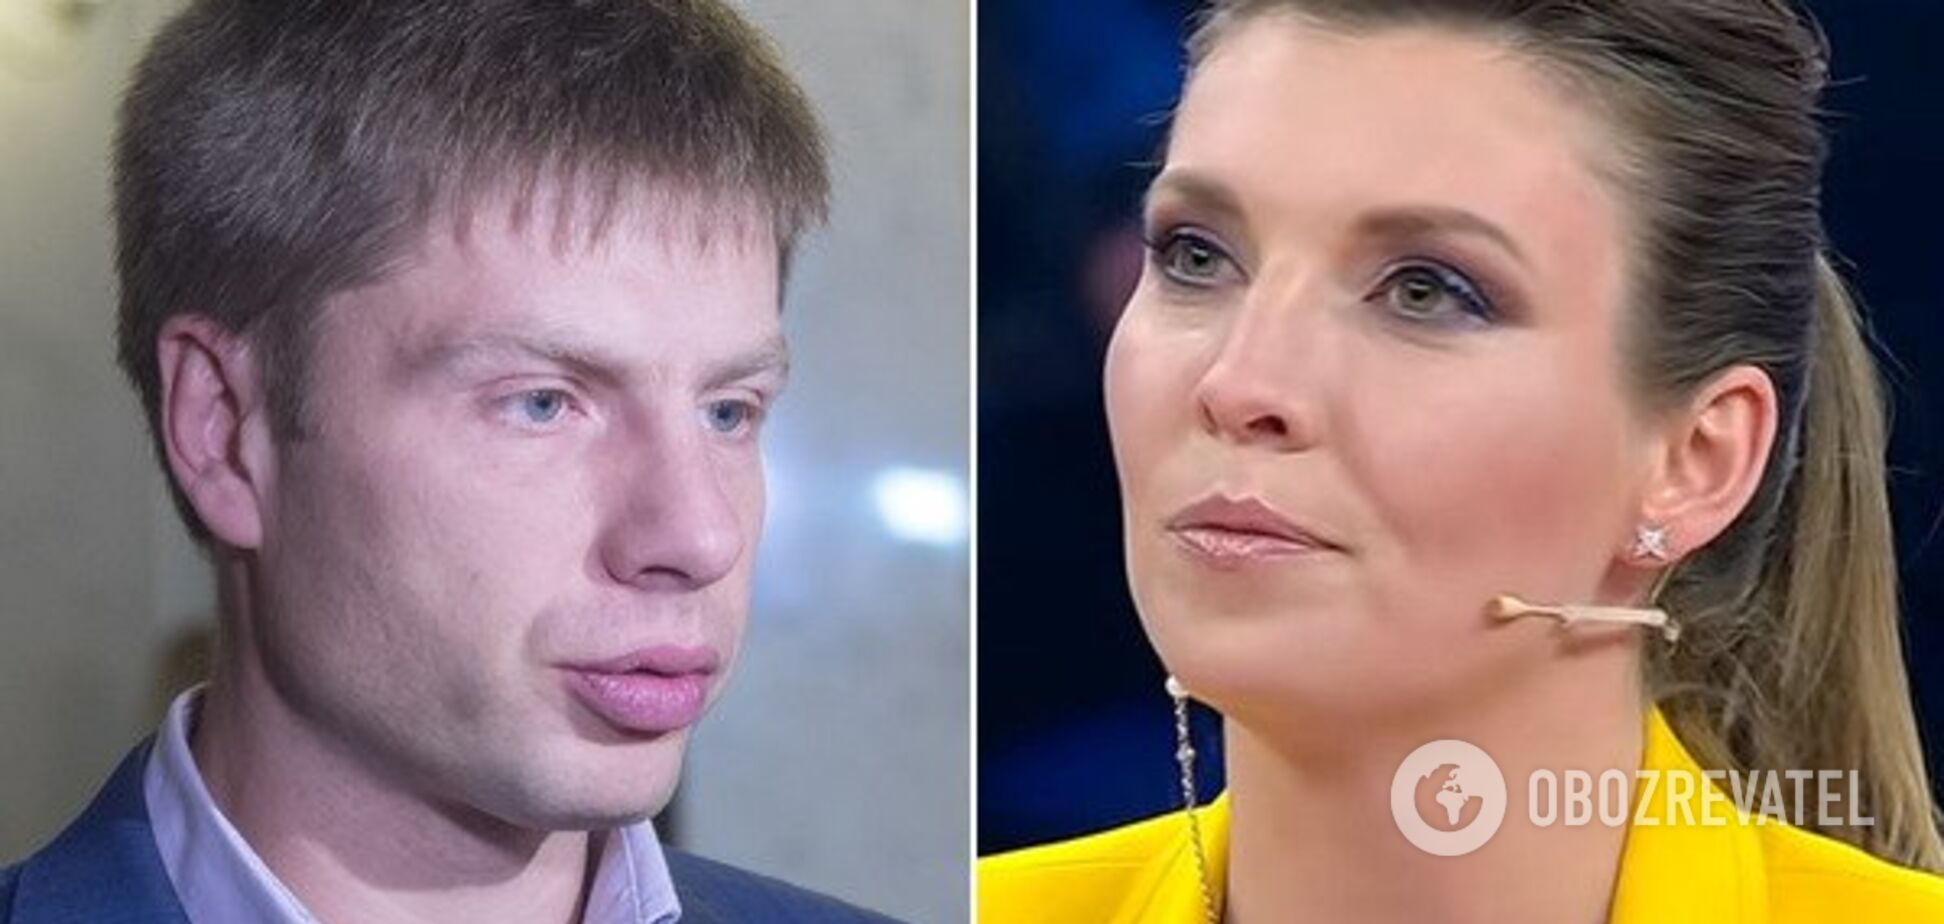 'Не пищи, дурочка': Гончаренко жестко пригрозил Скабеевой. Видео